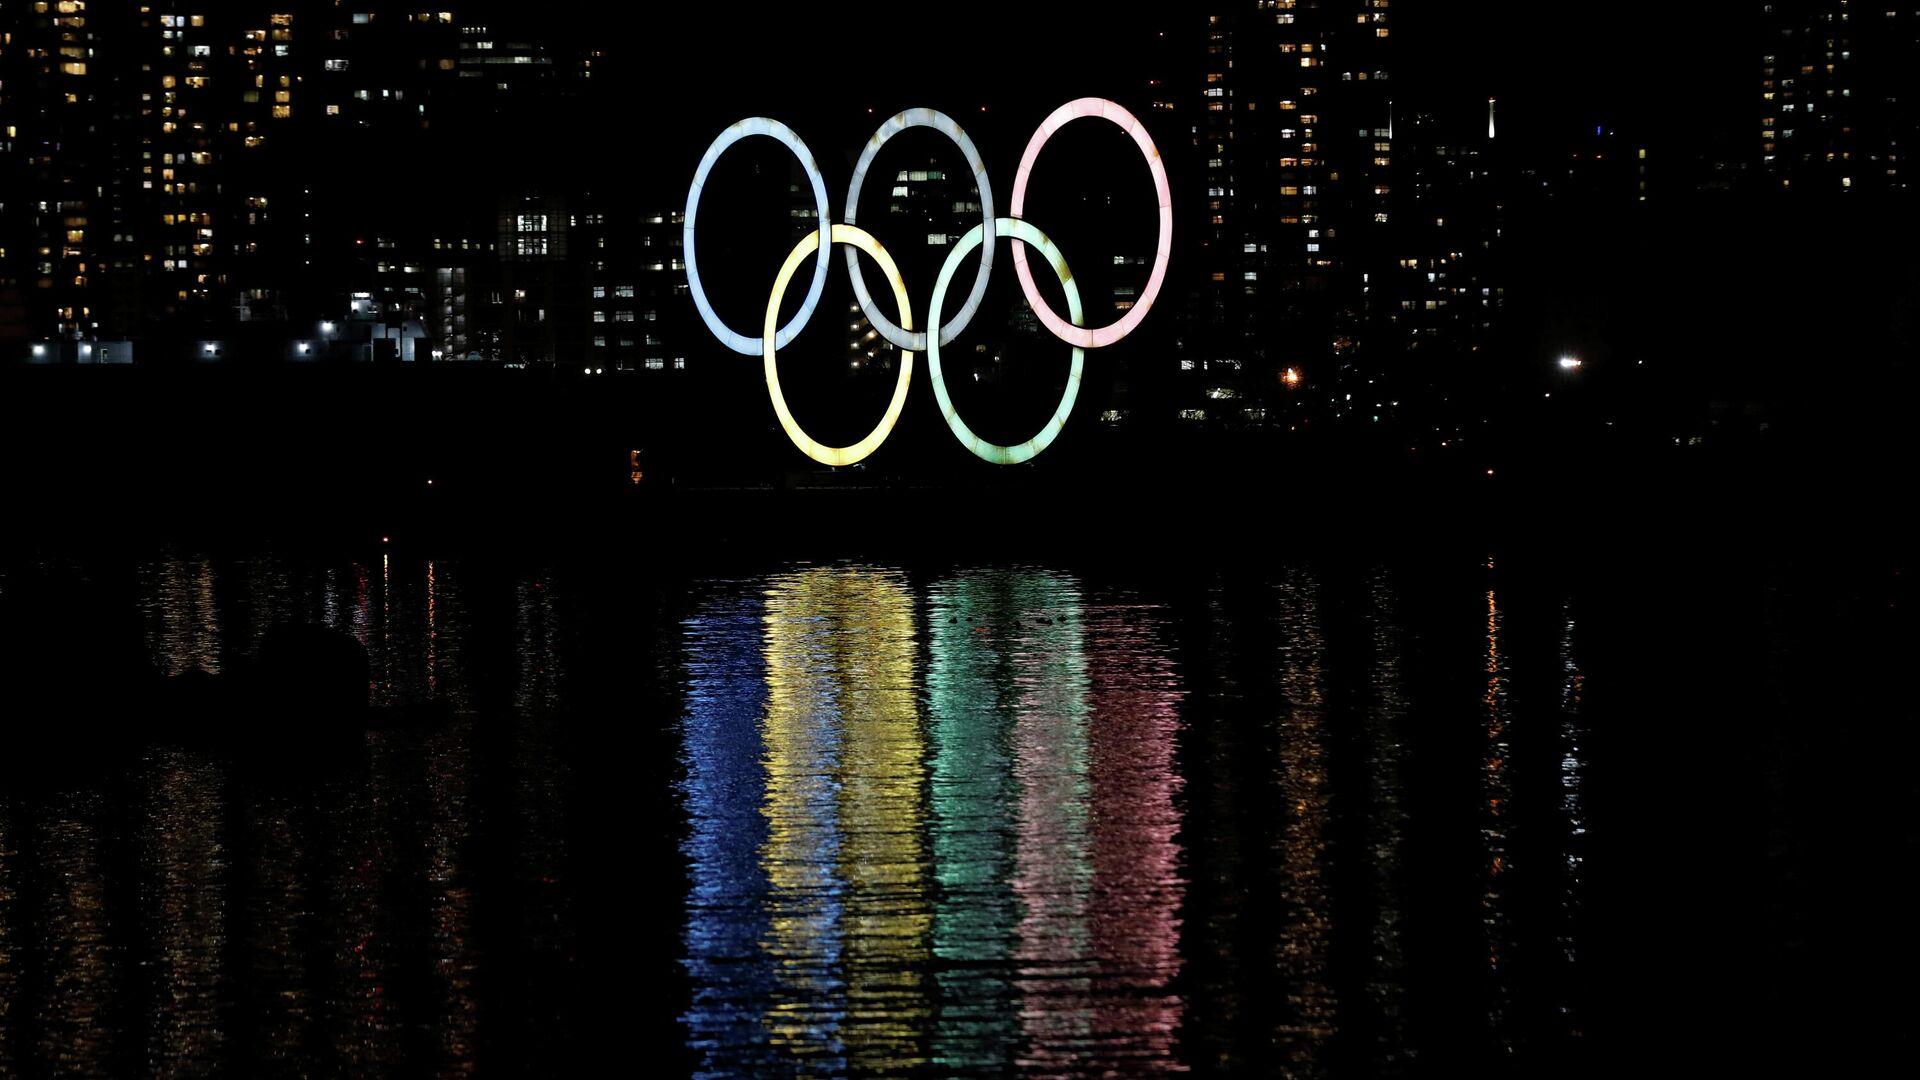 Олимпийские кольца в Токио - РИА Новости, 1920, 24.02.2021